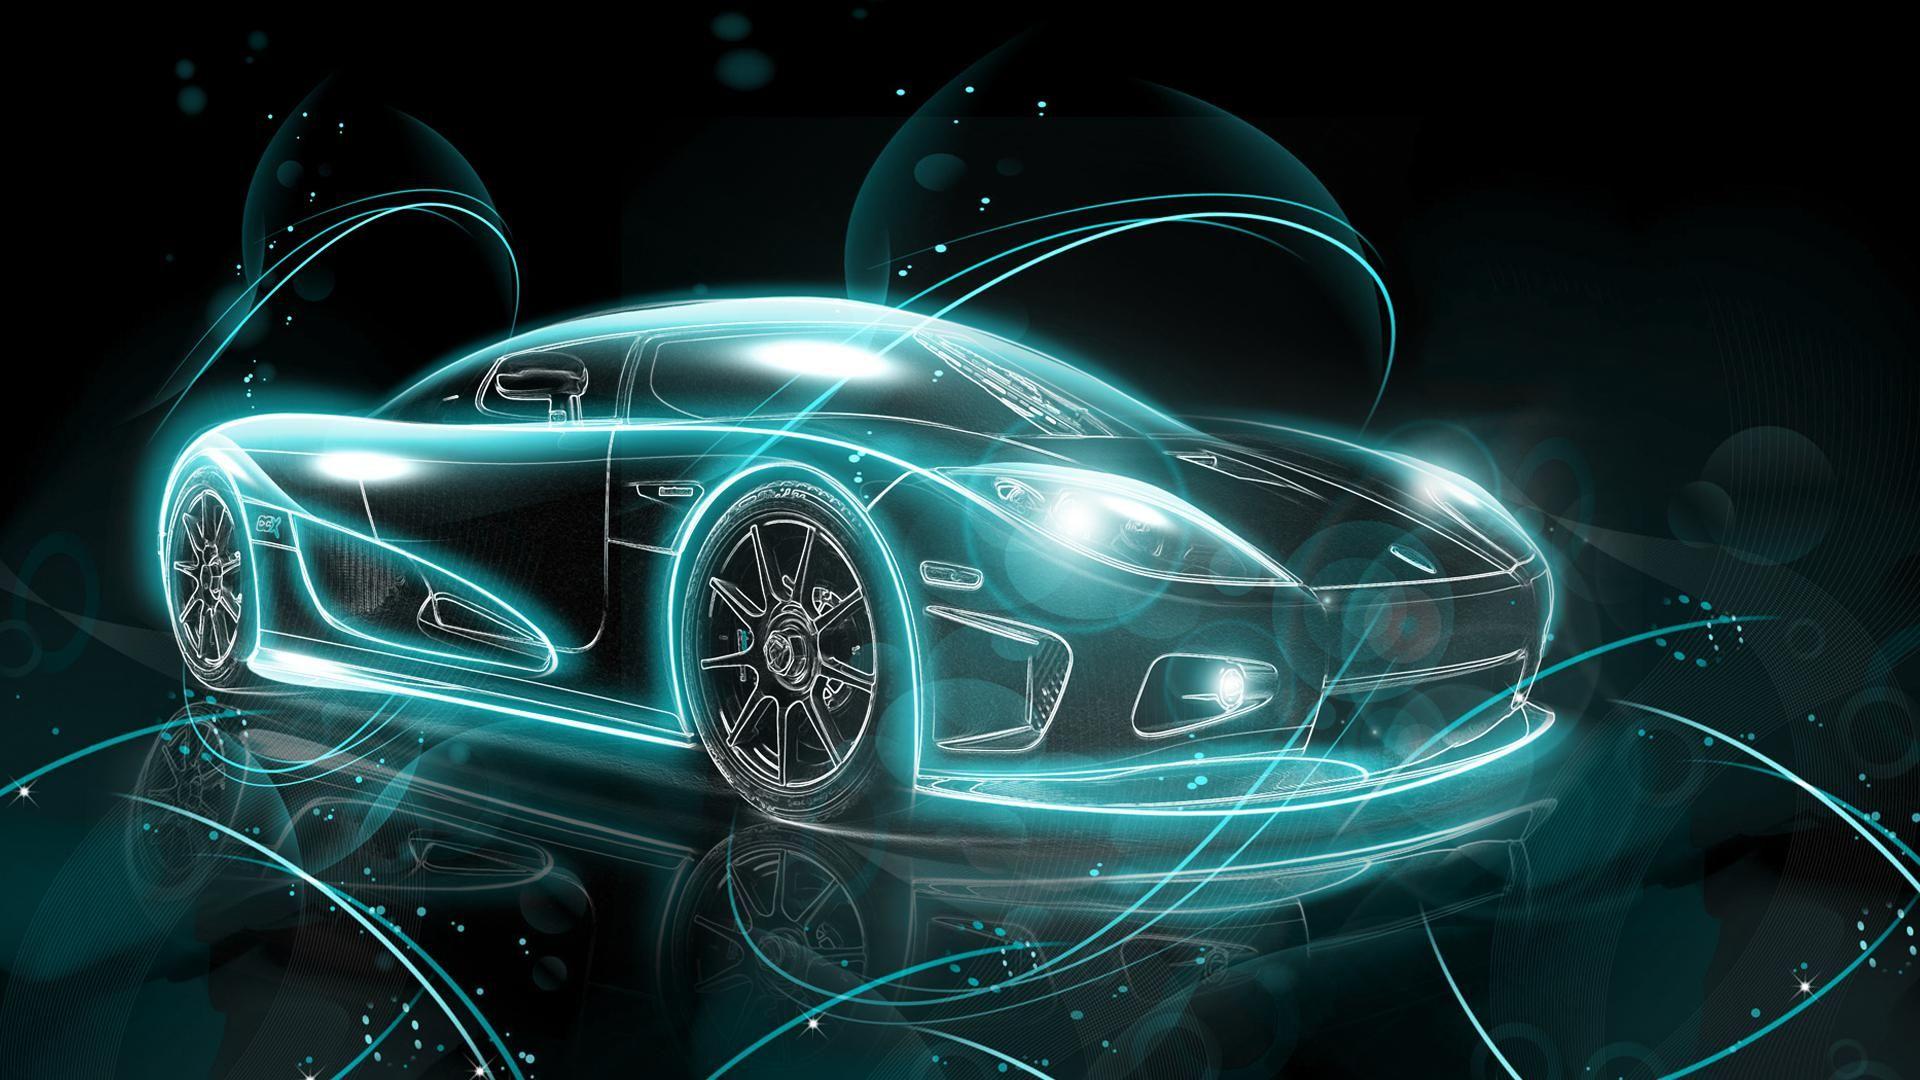 Download Neon Car Wallpapers Gallery Neon Car Car Hd Wallpaper